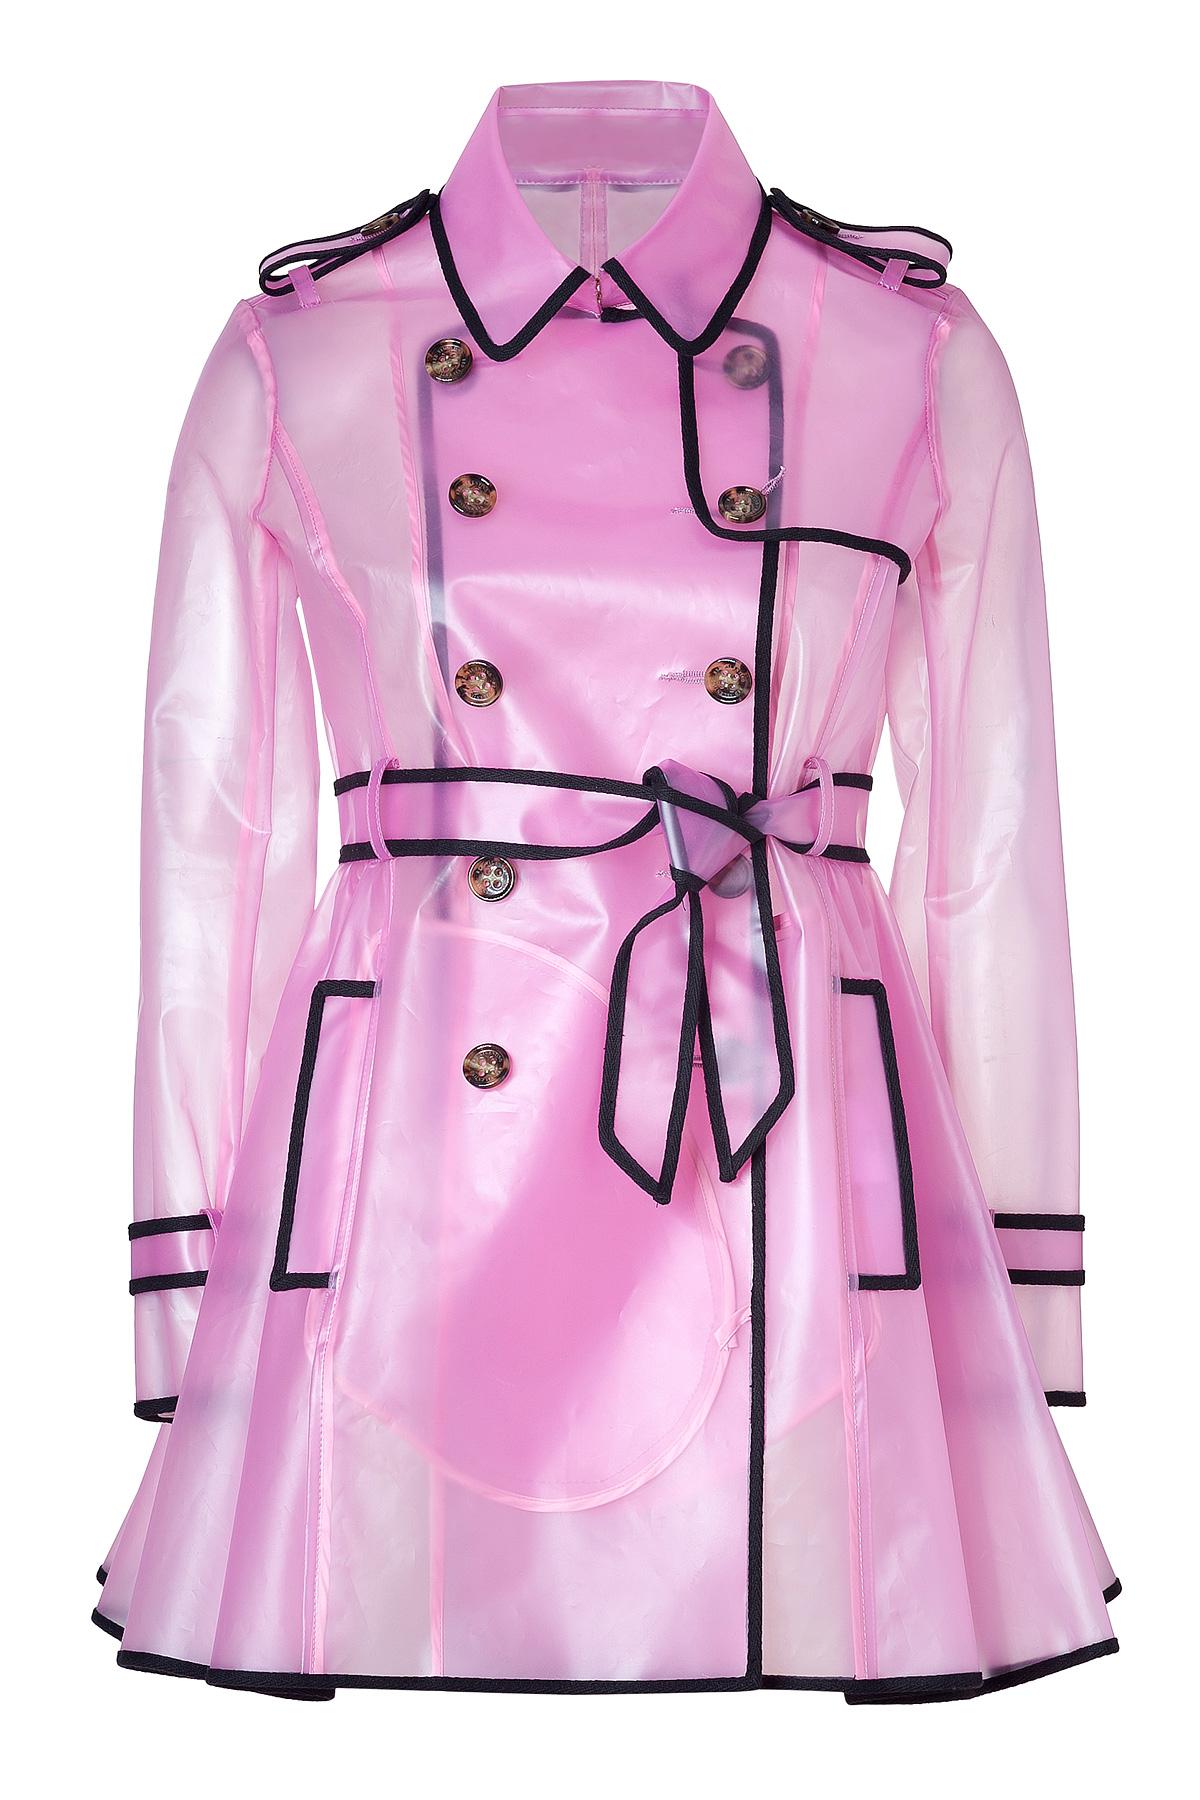 Stylish Rain Jackets